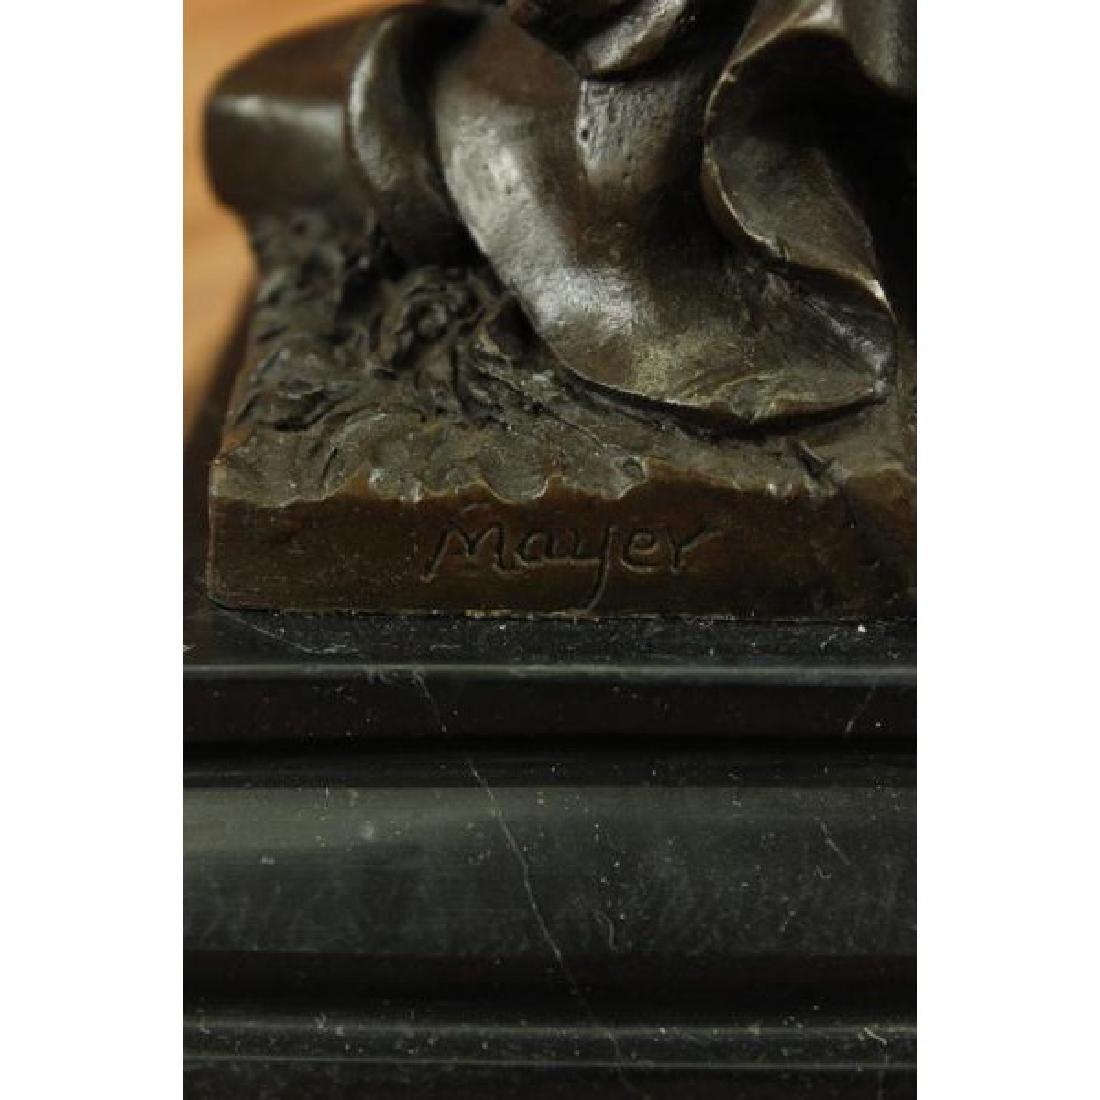 Blind Justice - Scale of Justice Bronze Sculpture - 6